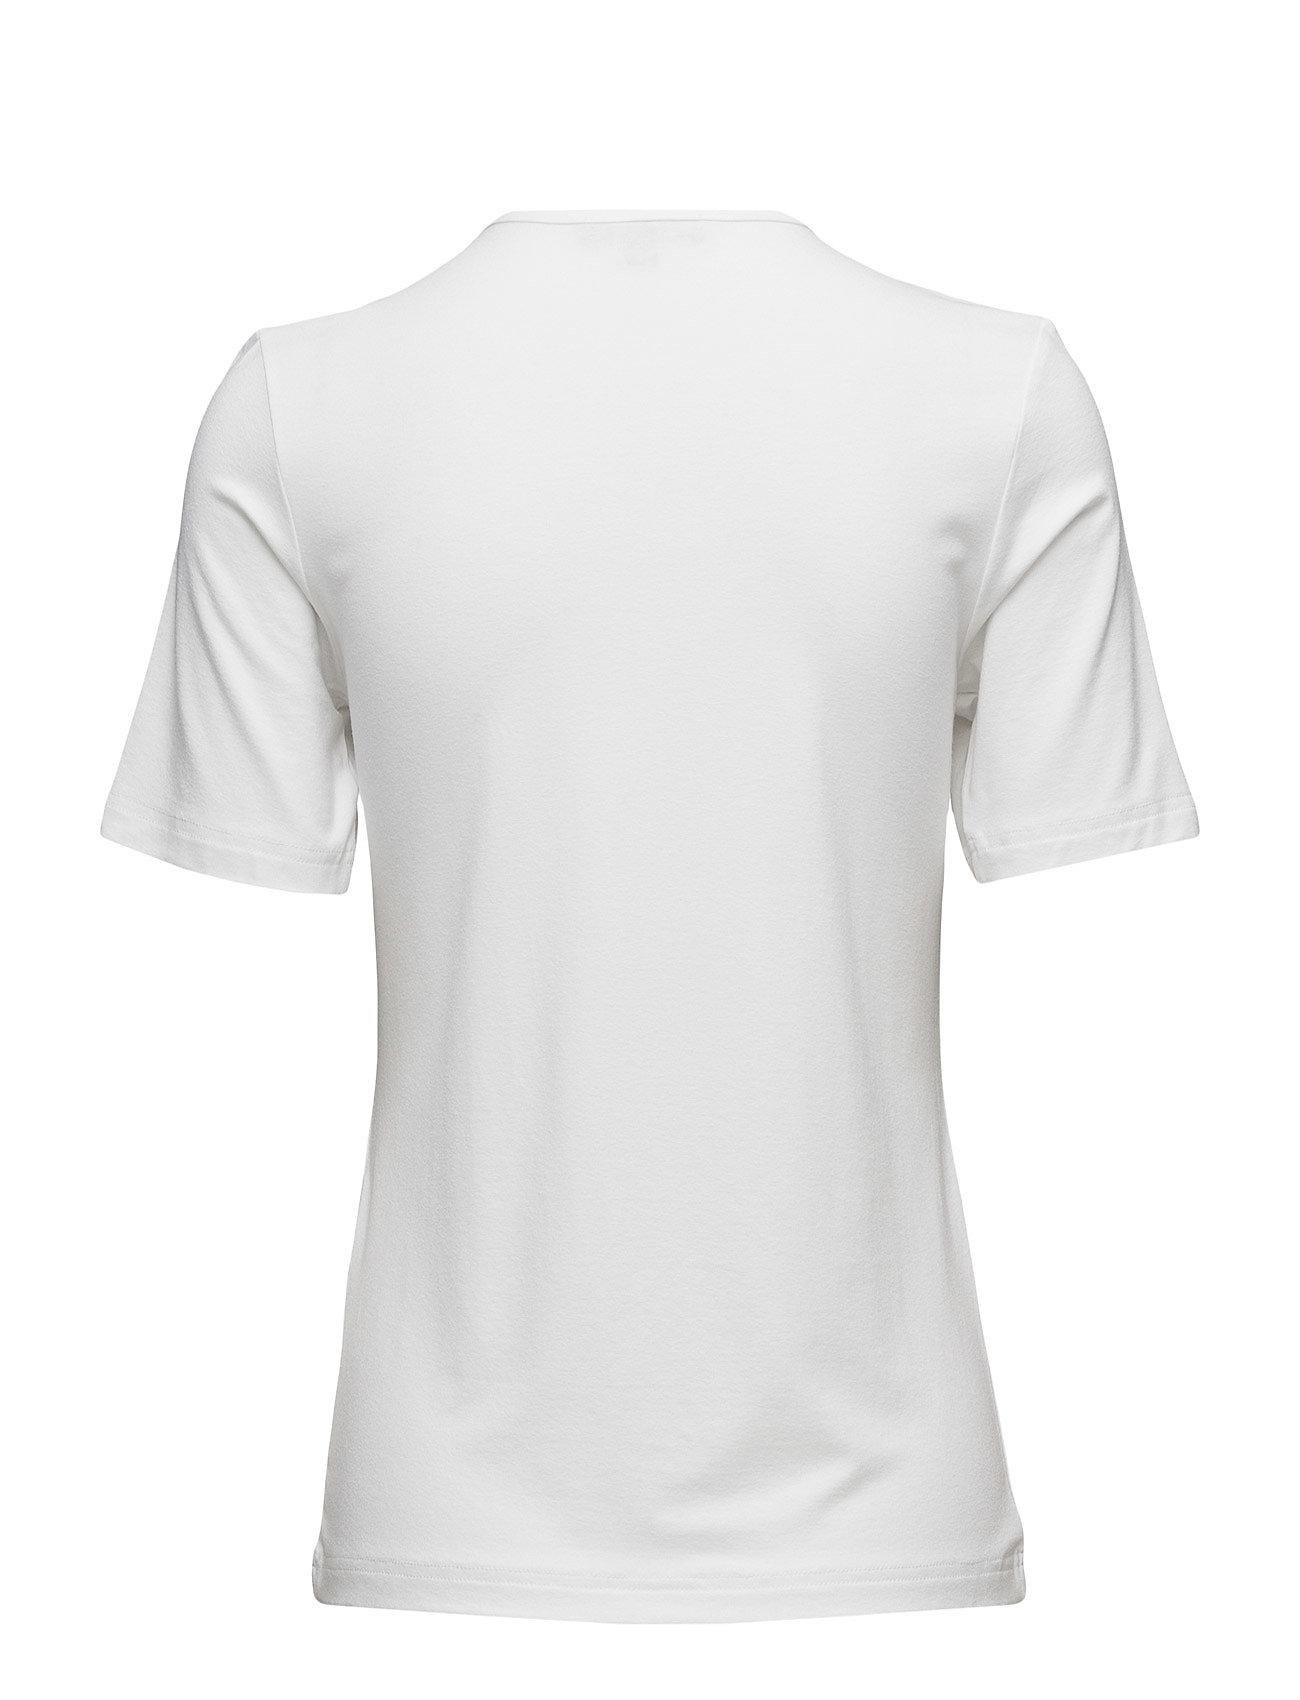 7112970b T-Shirt S/S Brandtex Kortermet til - MoteJakten.no | MoteJakten.no